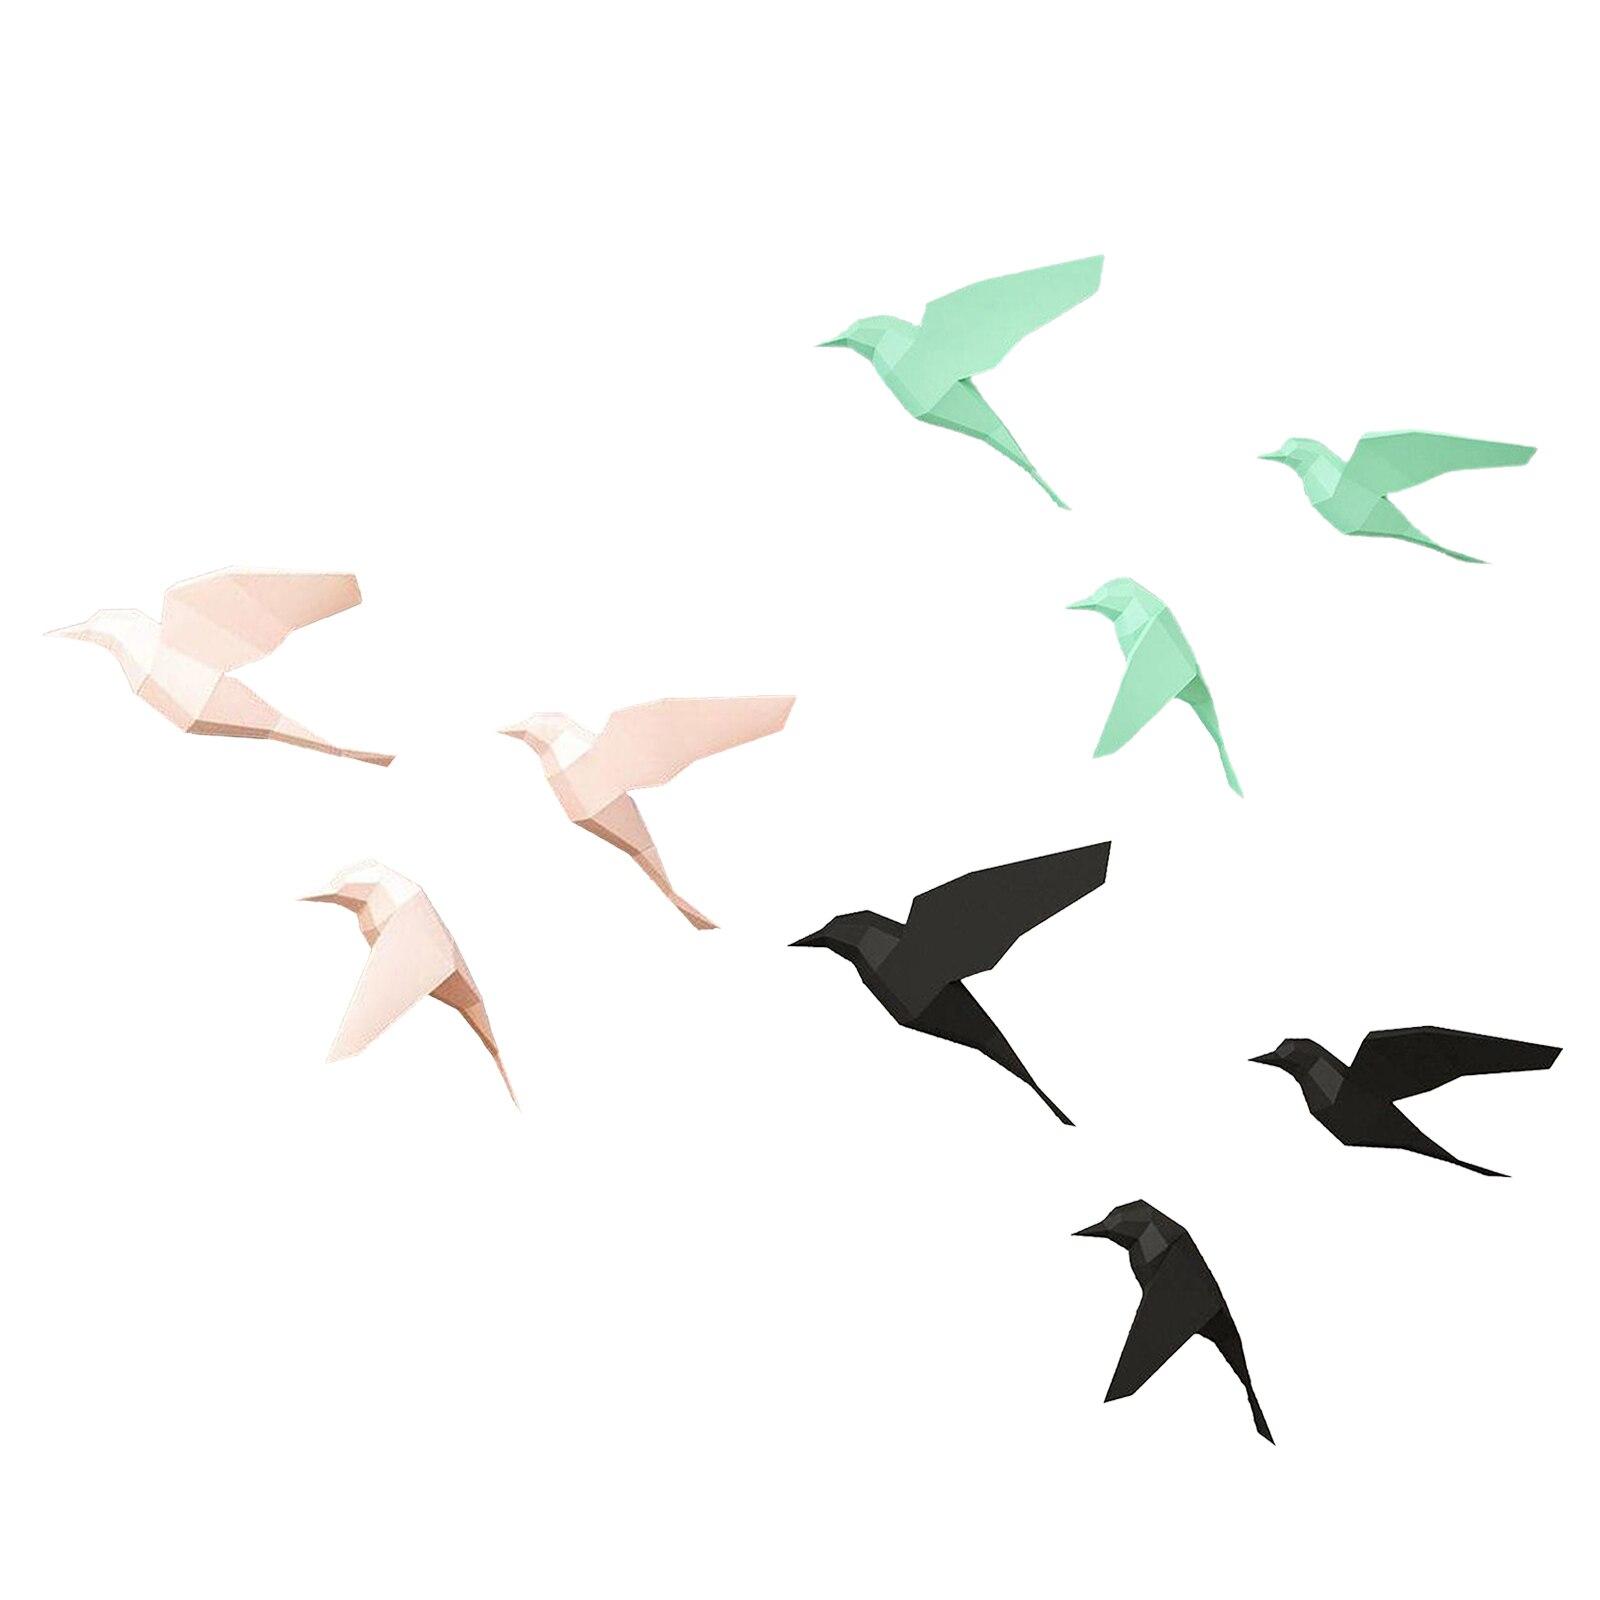 1Set 3D Paper Model  Papercraft Home Decor Wall Decoration Bird Puzzles Educational DIY Kids Toys Gift